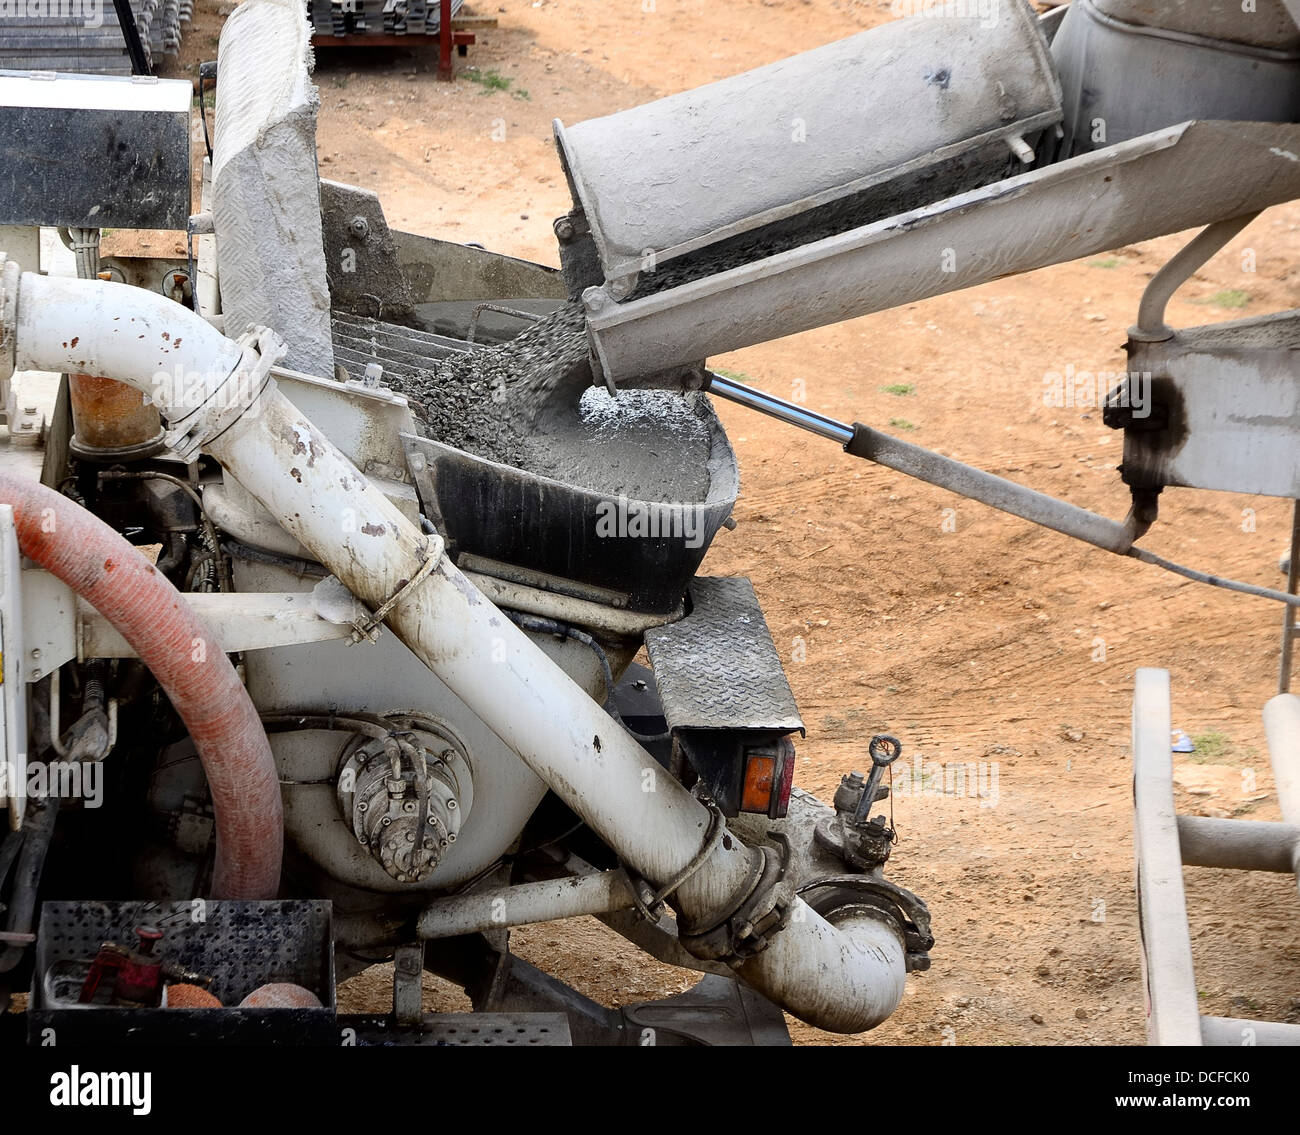 Pump Trailer Stock Photos & Pump Trailer Stock Images - Alamy